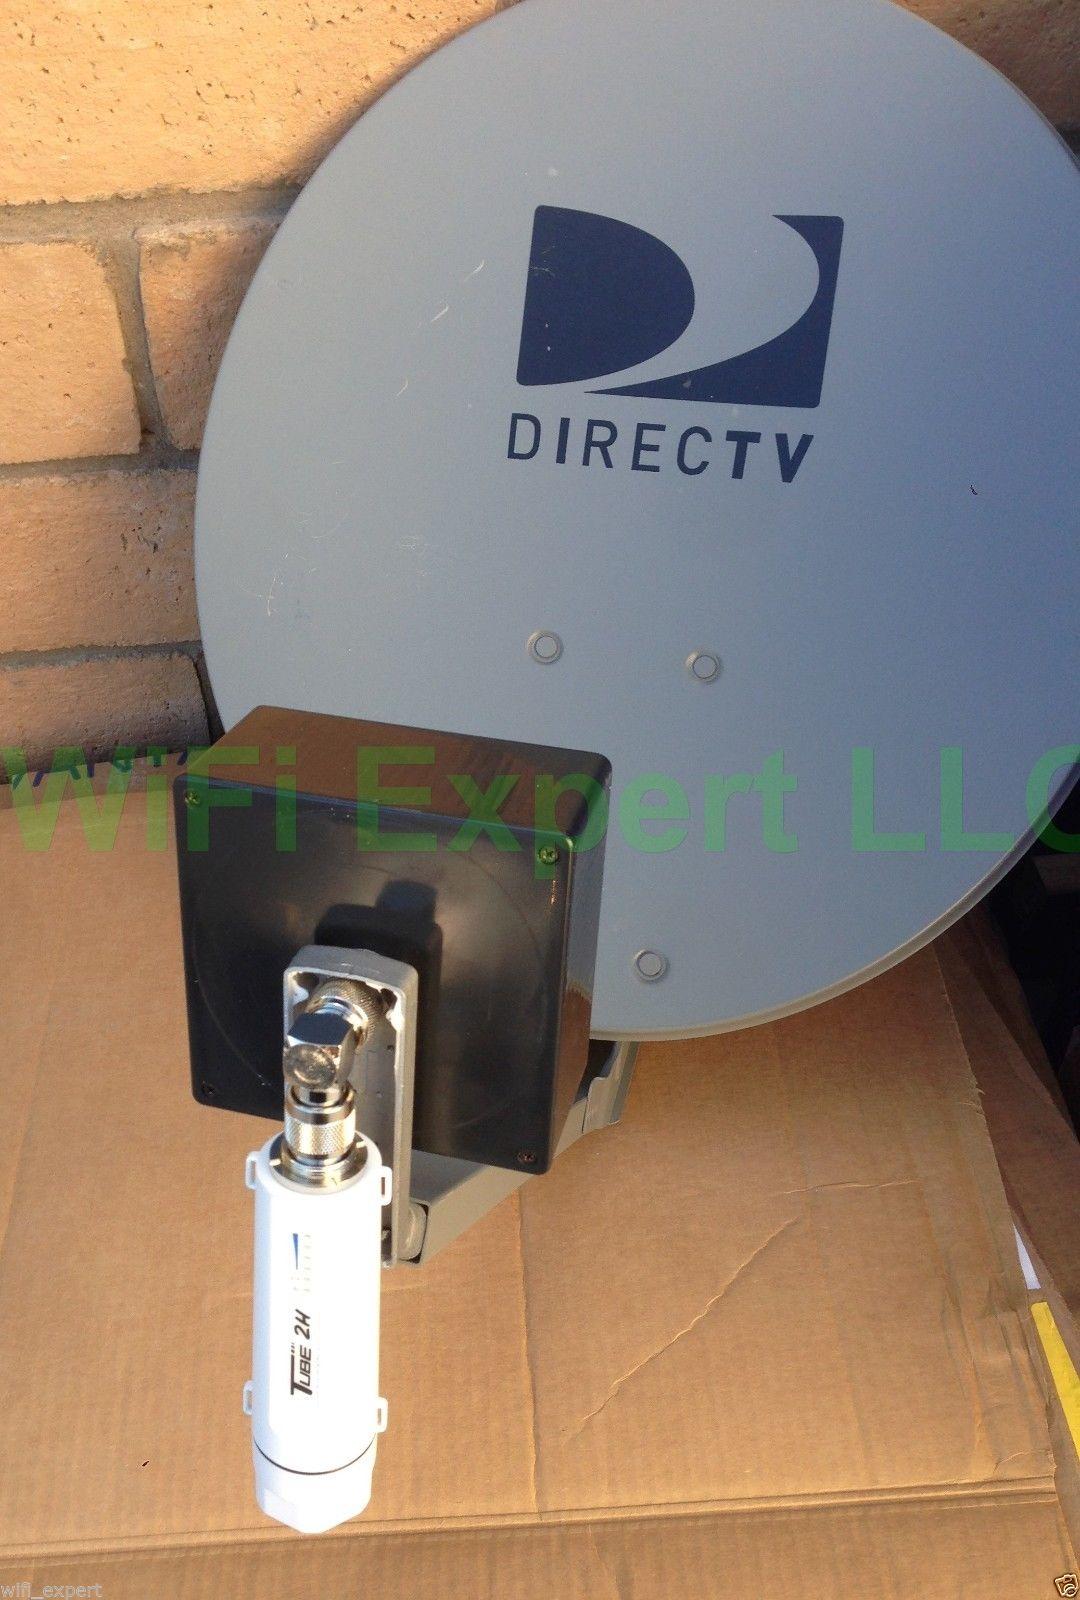 Dish Biquad Wifi Antenna Alfa R36 Poe Tube 2h Booster